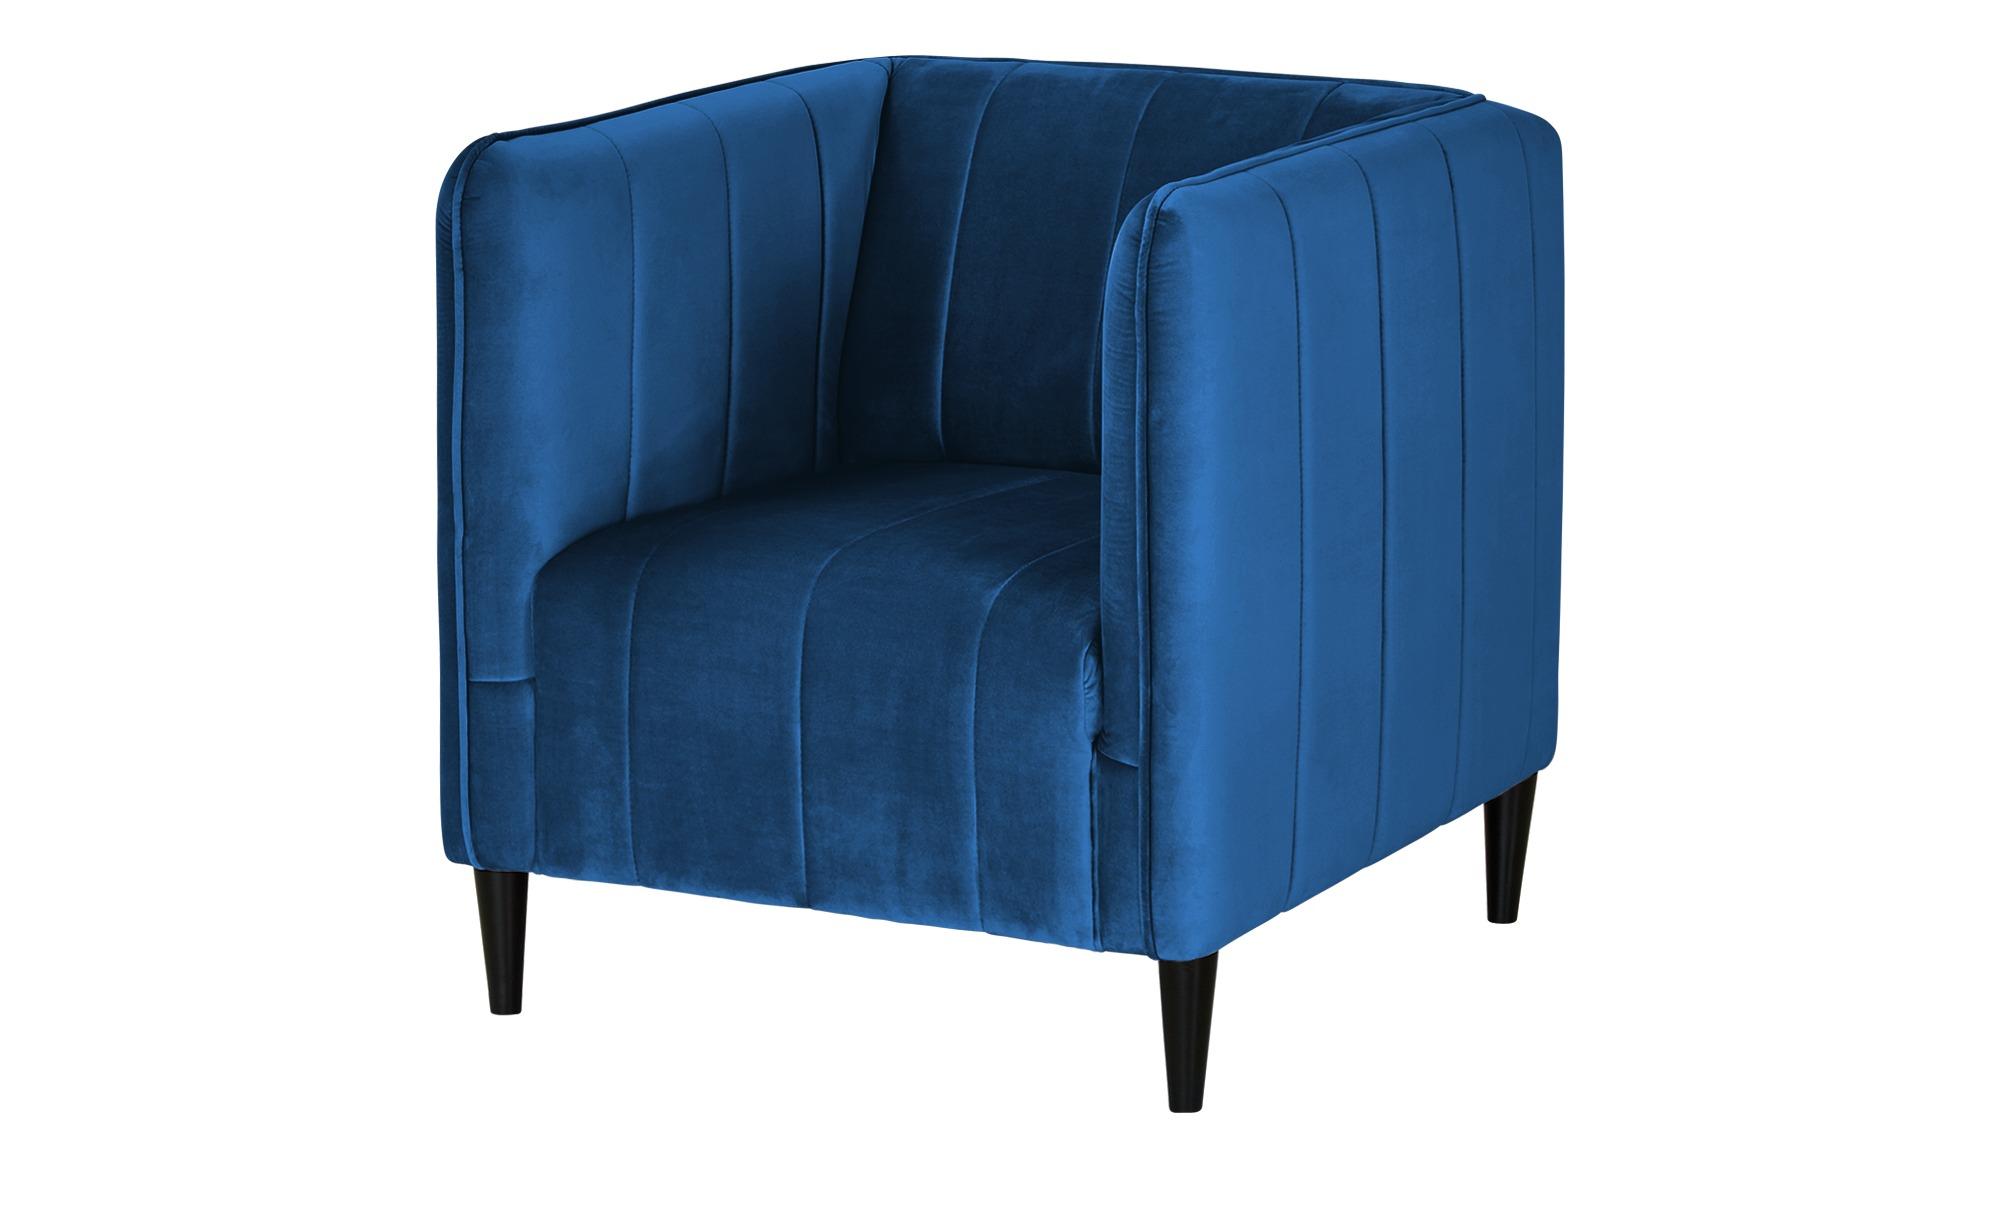 smart Sessel  Sara ¦ blau ¦ Maße (cm): B: 72 H: 74 T: 76 Polstermöbel > Sessel > Polstersessel - Höffner